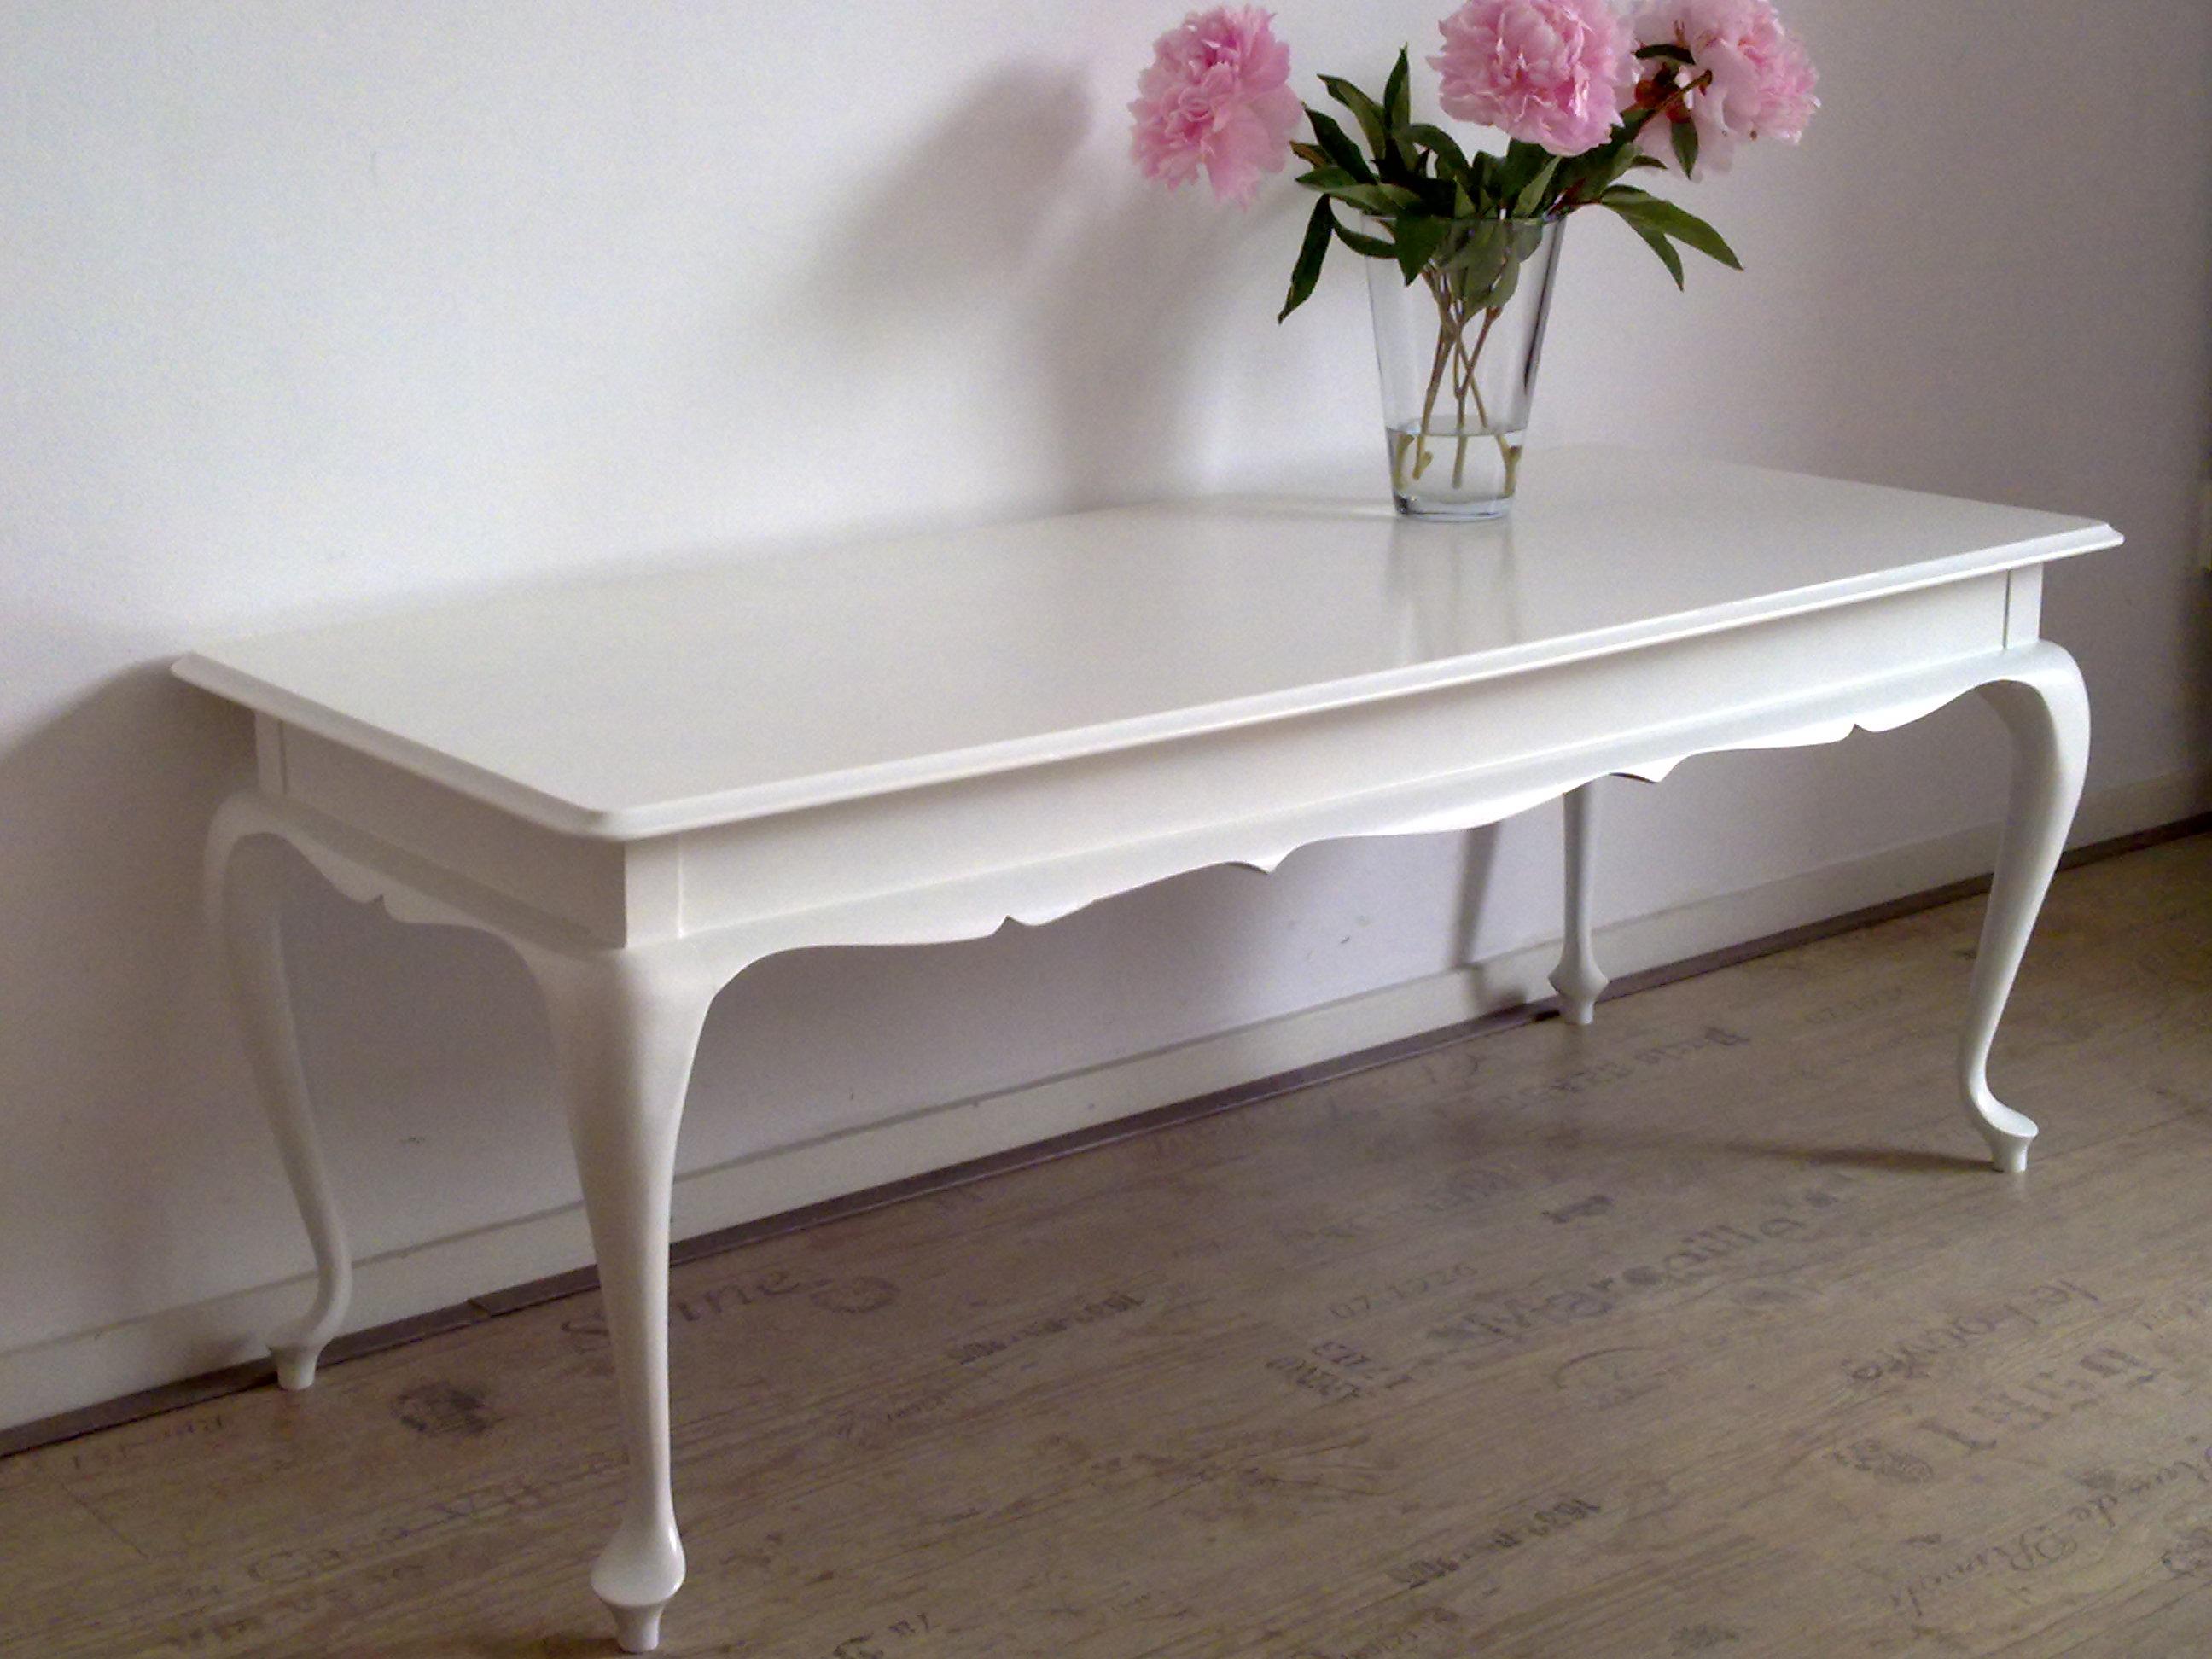 Brocante Witte Eetkamertafel.Witte Queen Ann Barok Salontafel Te Design Barok Stoelen En Barok